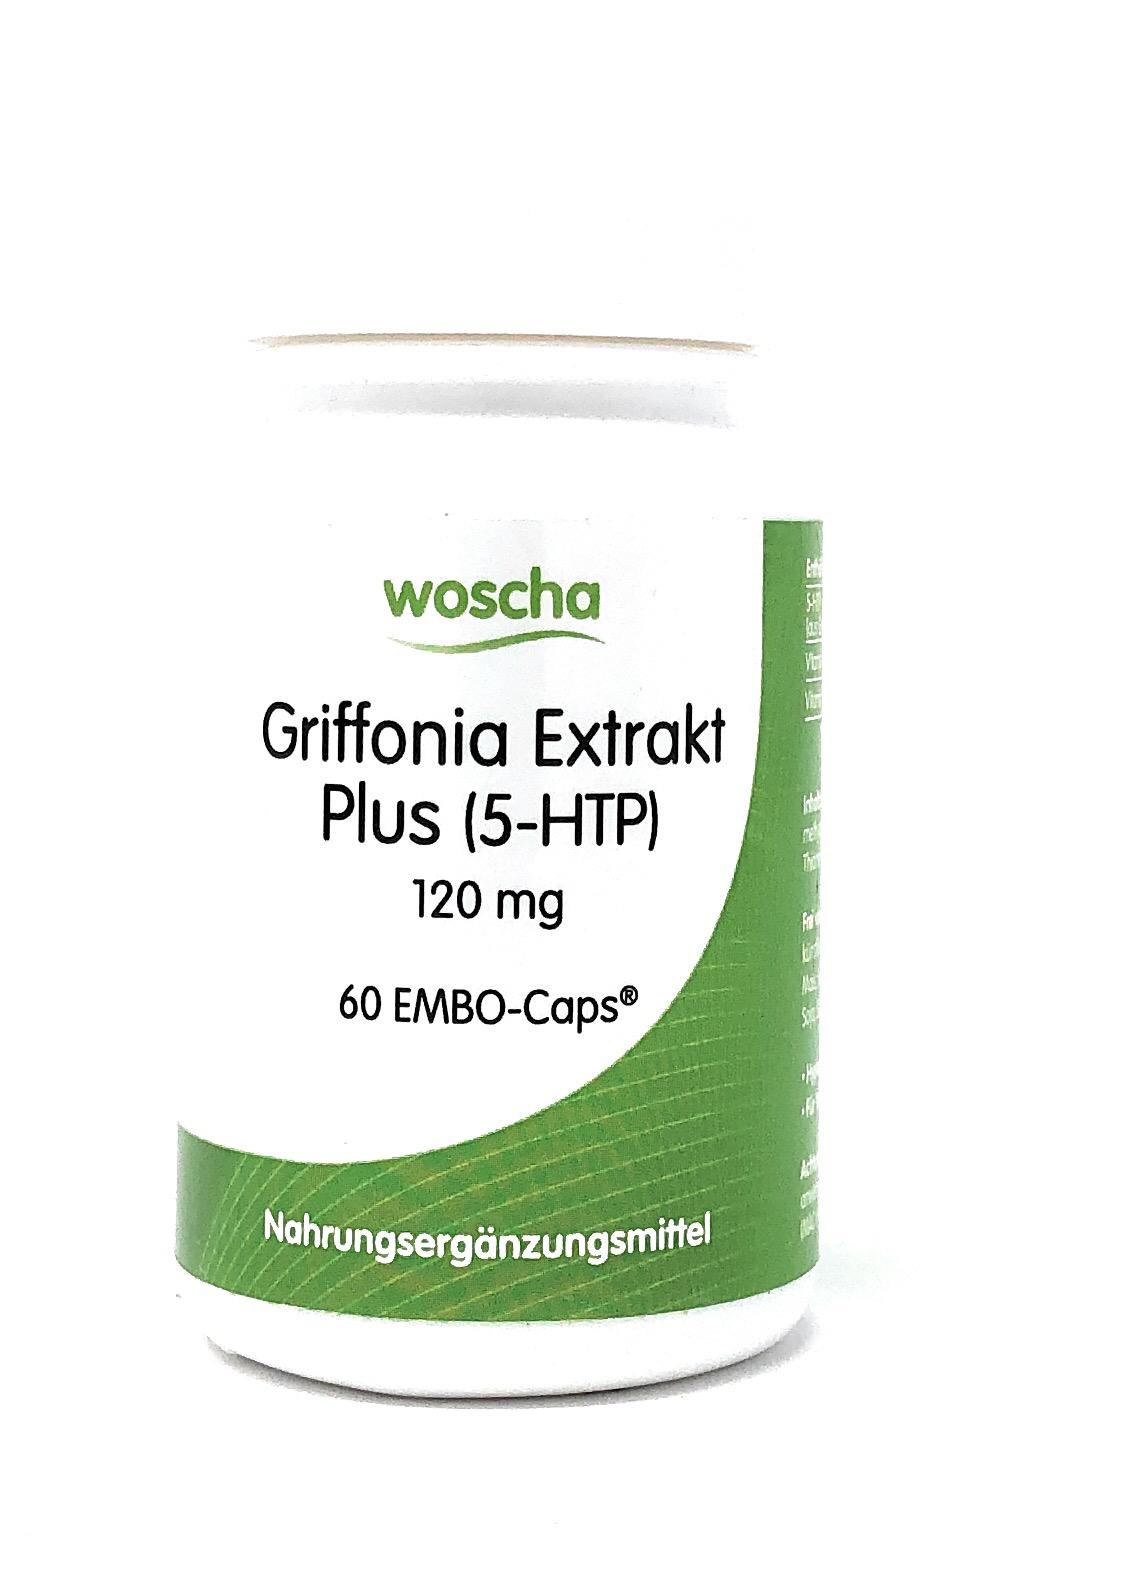 woscha Griffonia Extrakt Plus 60 Embo-CAPS®  (14g) (vegan)